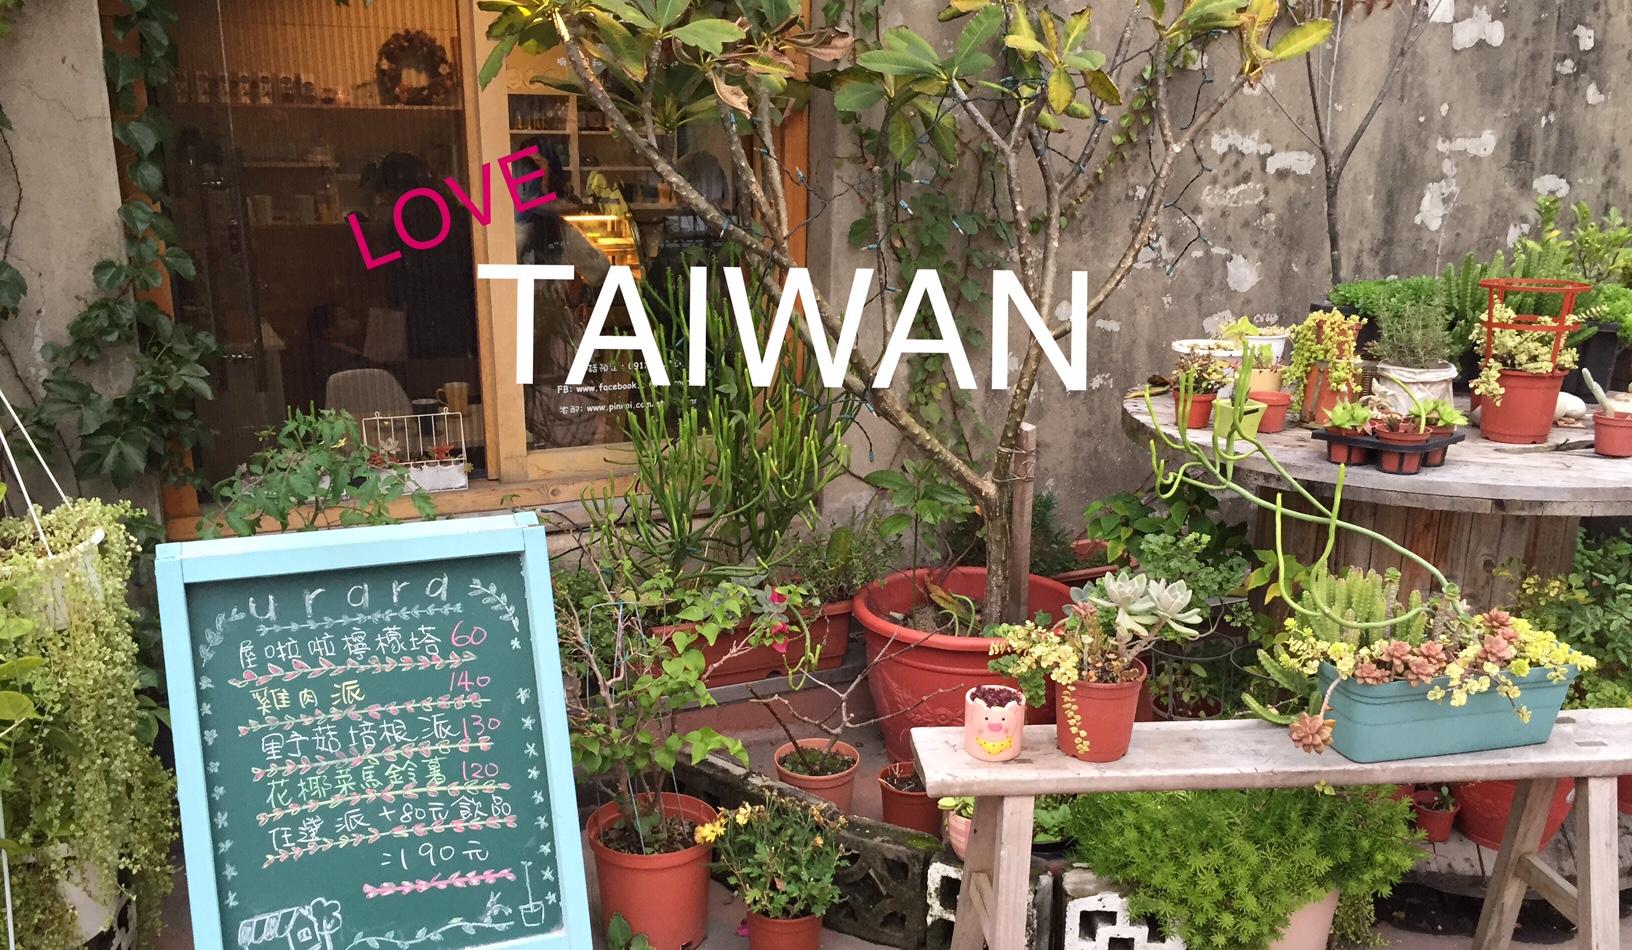 Vol.6 台湾 台北オーガニックショップ&マルシェ